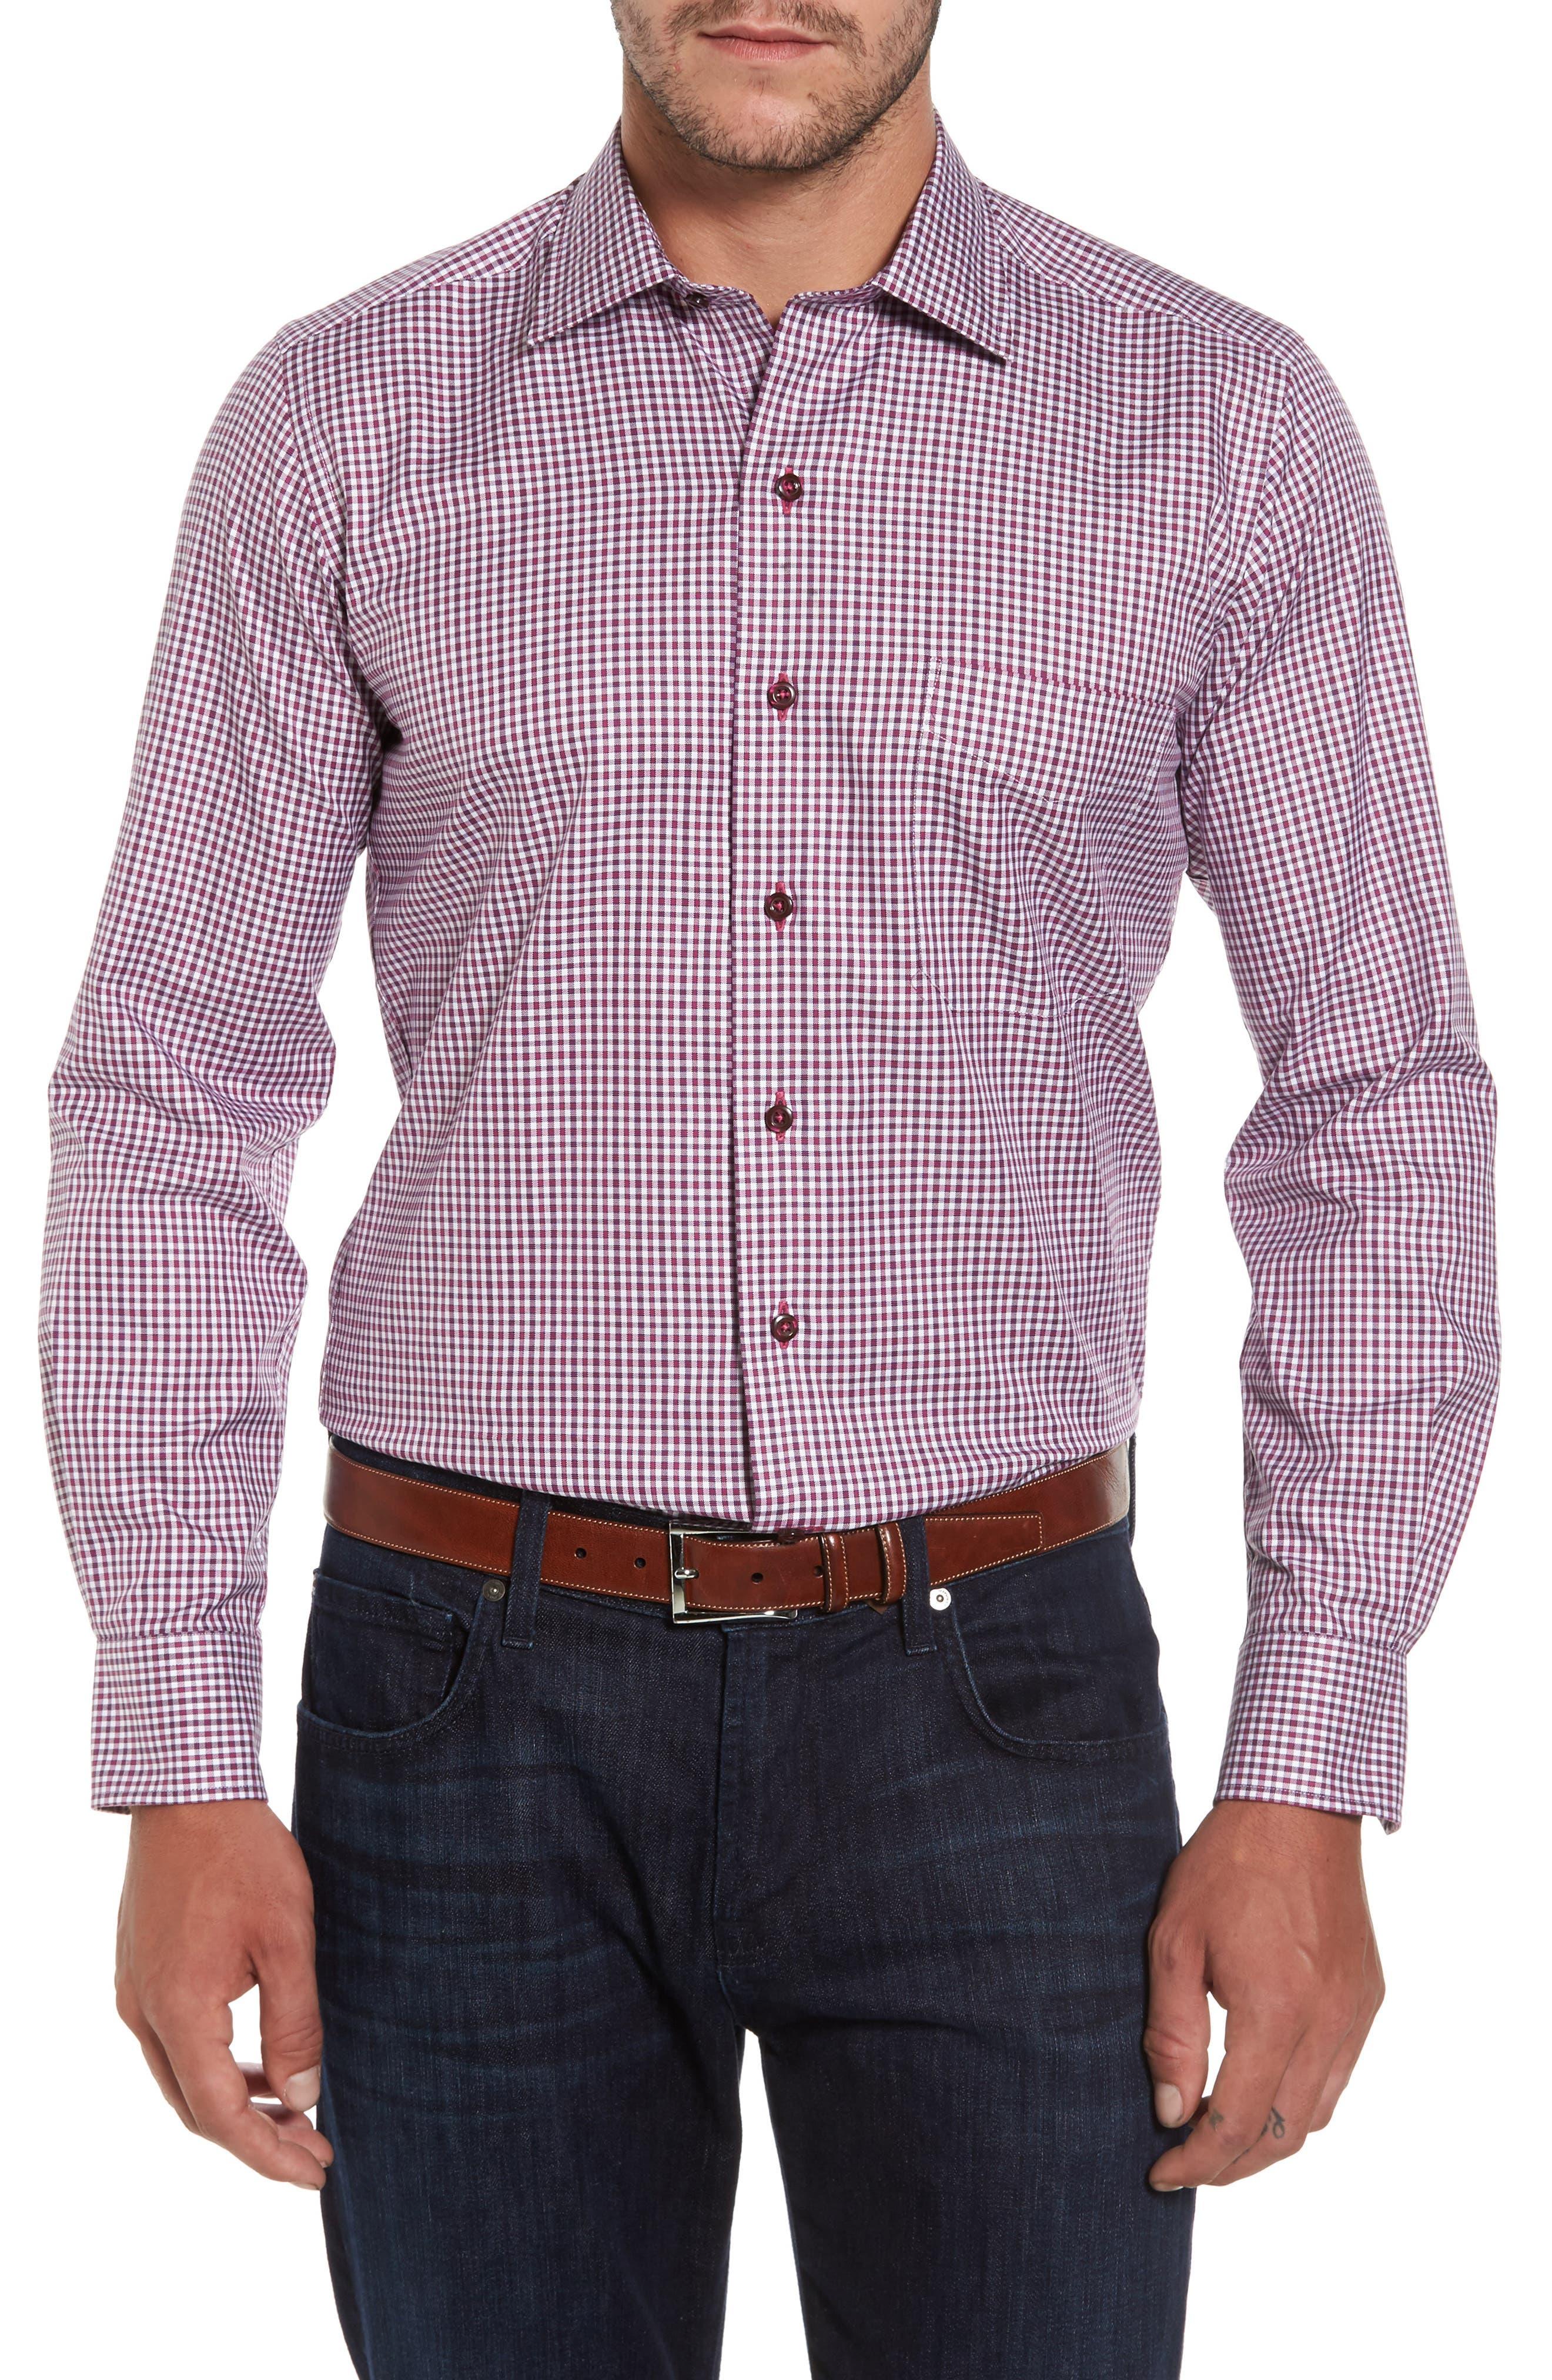 Main Image - David Donahue Plaid Regular Fit Sport Shirt